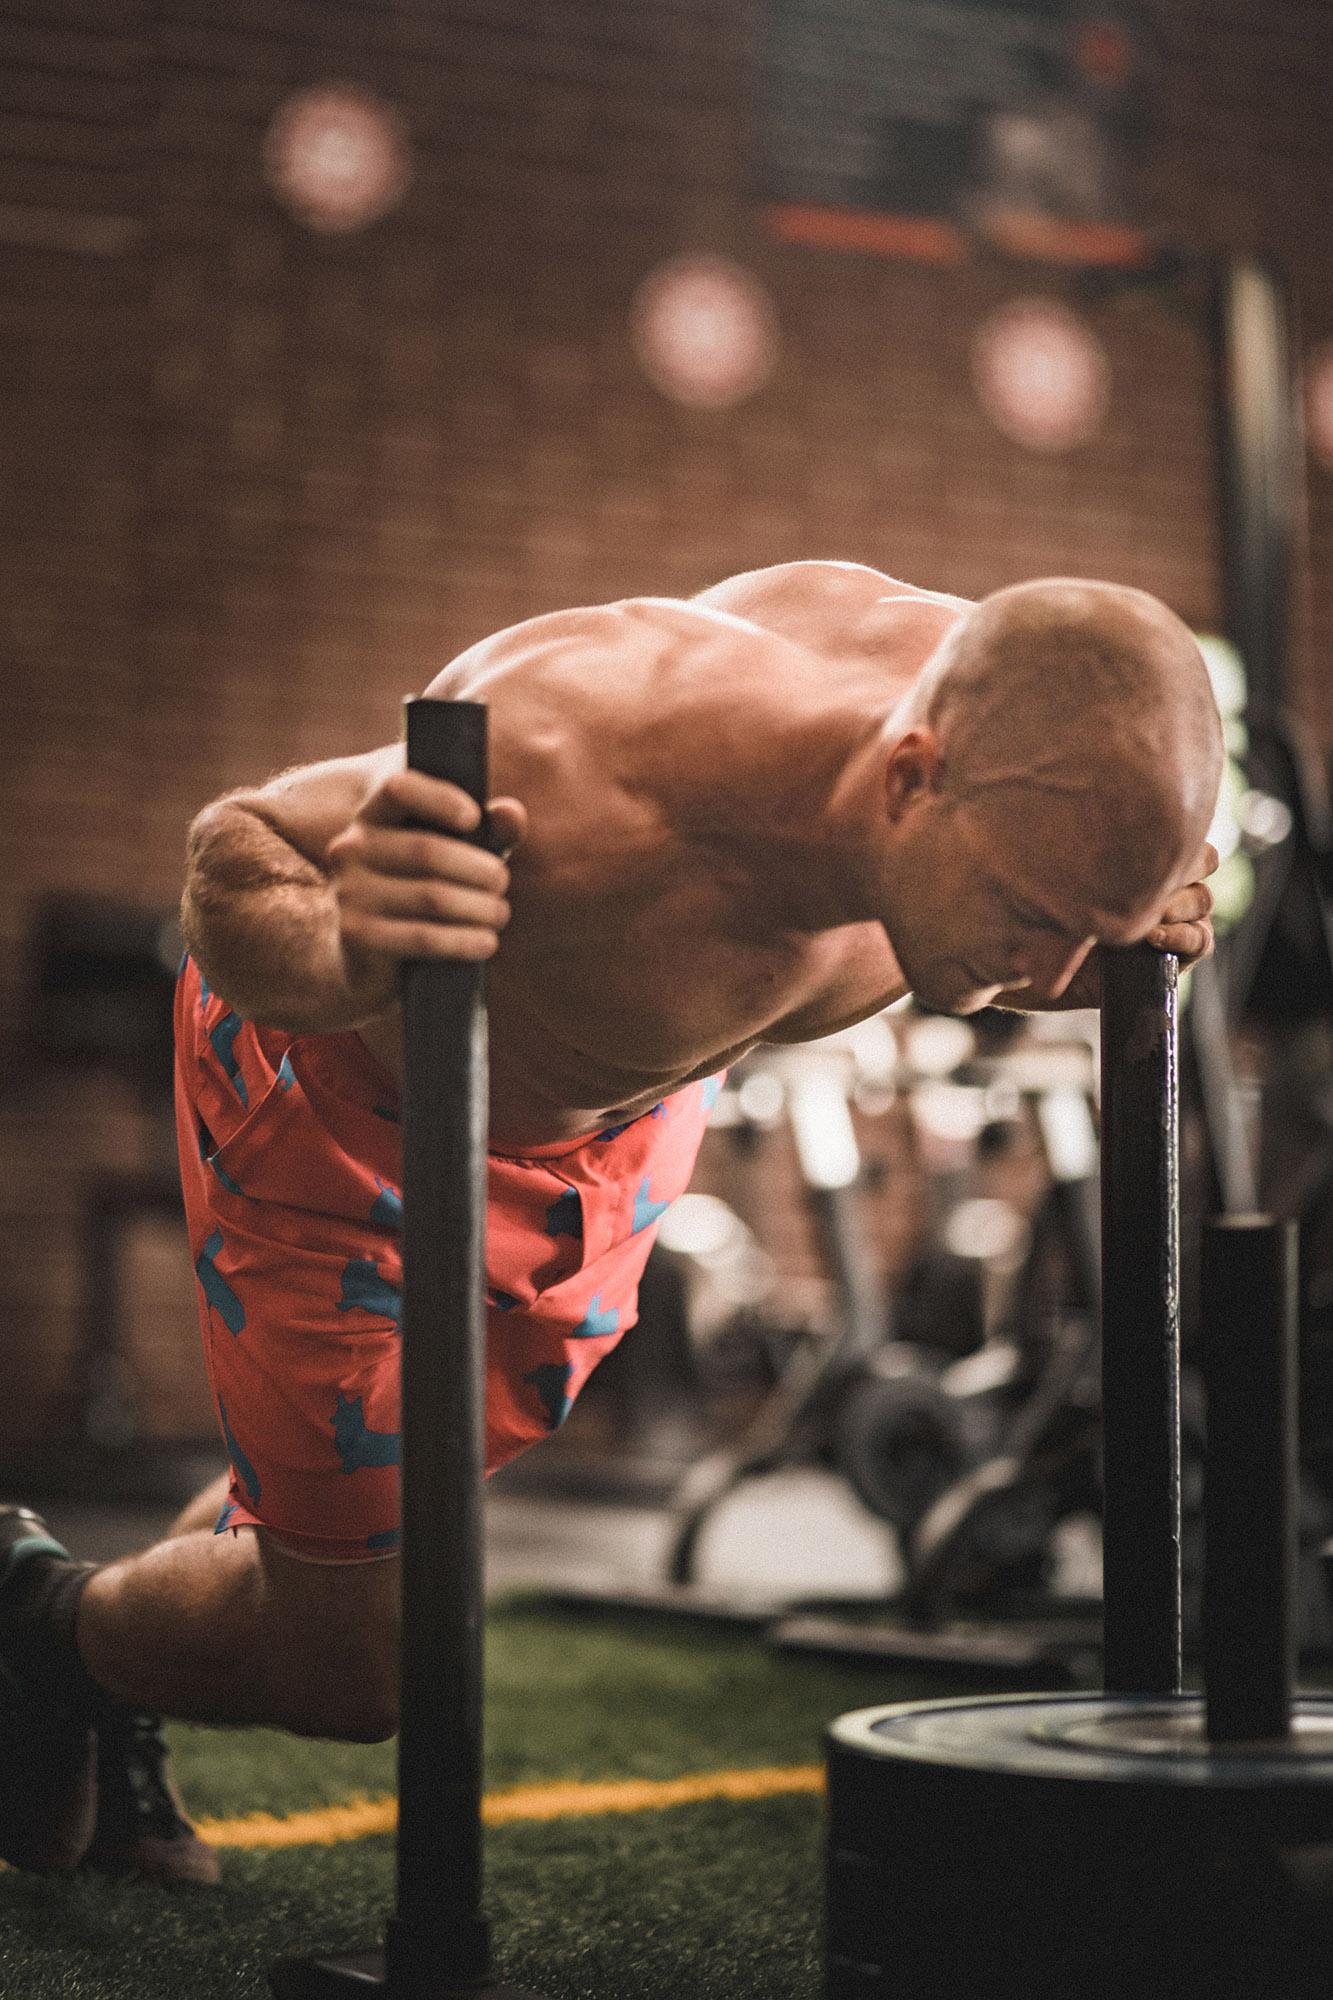 man doing aerobic workouts